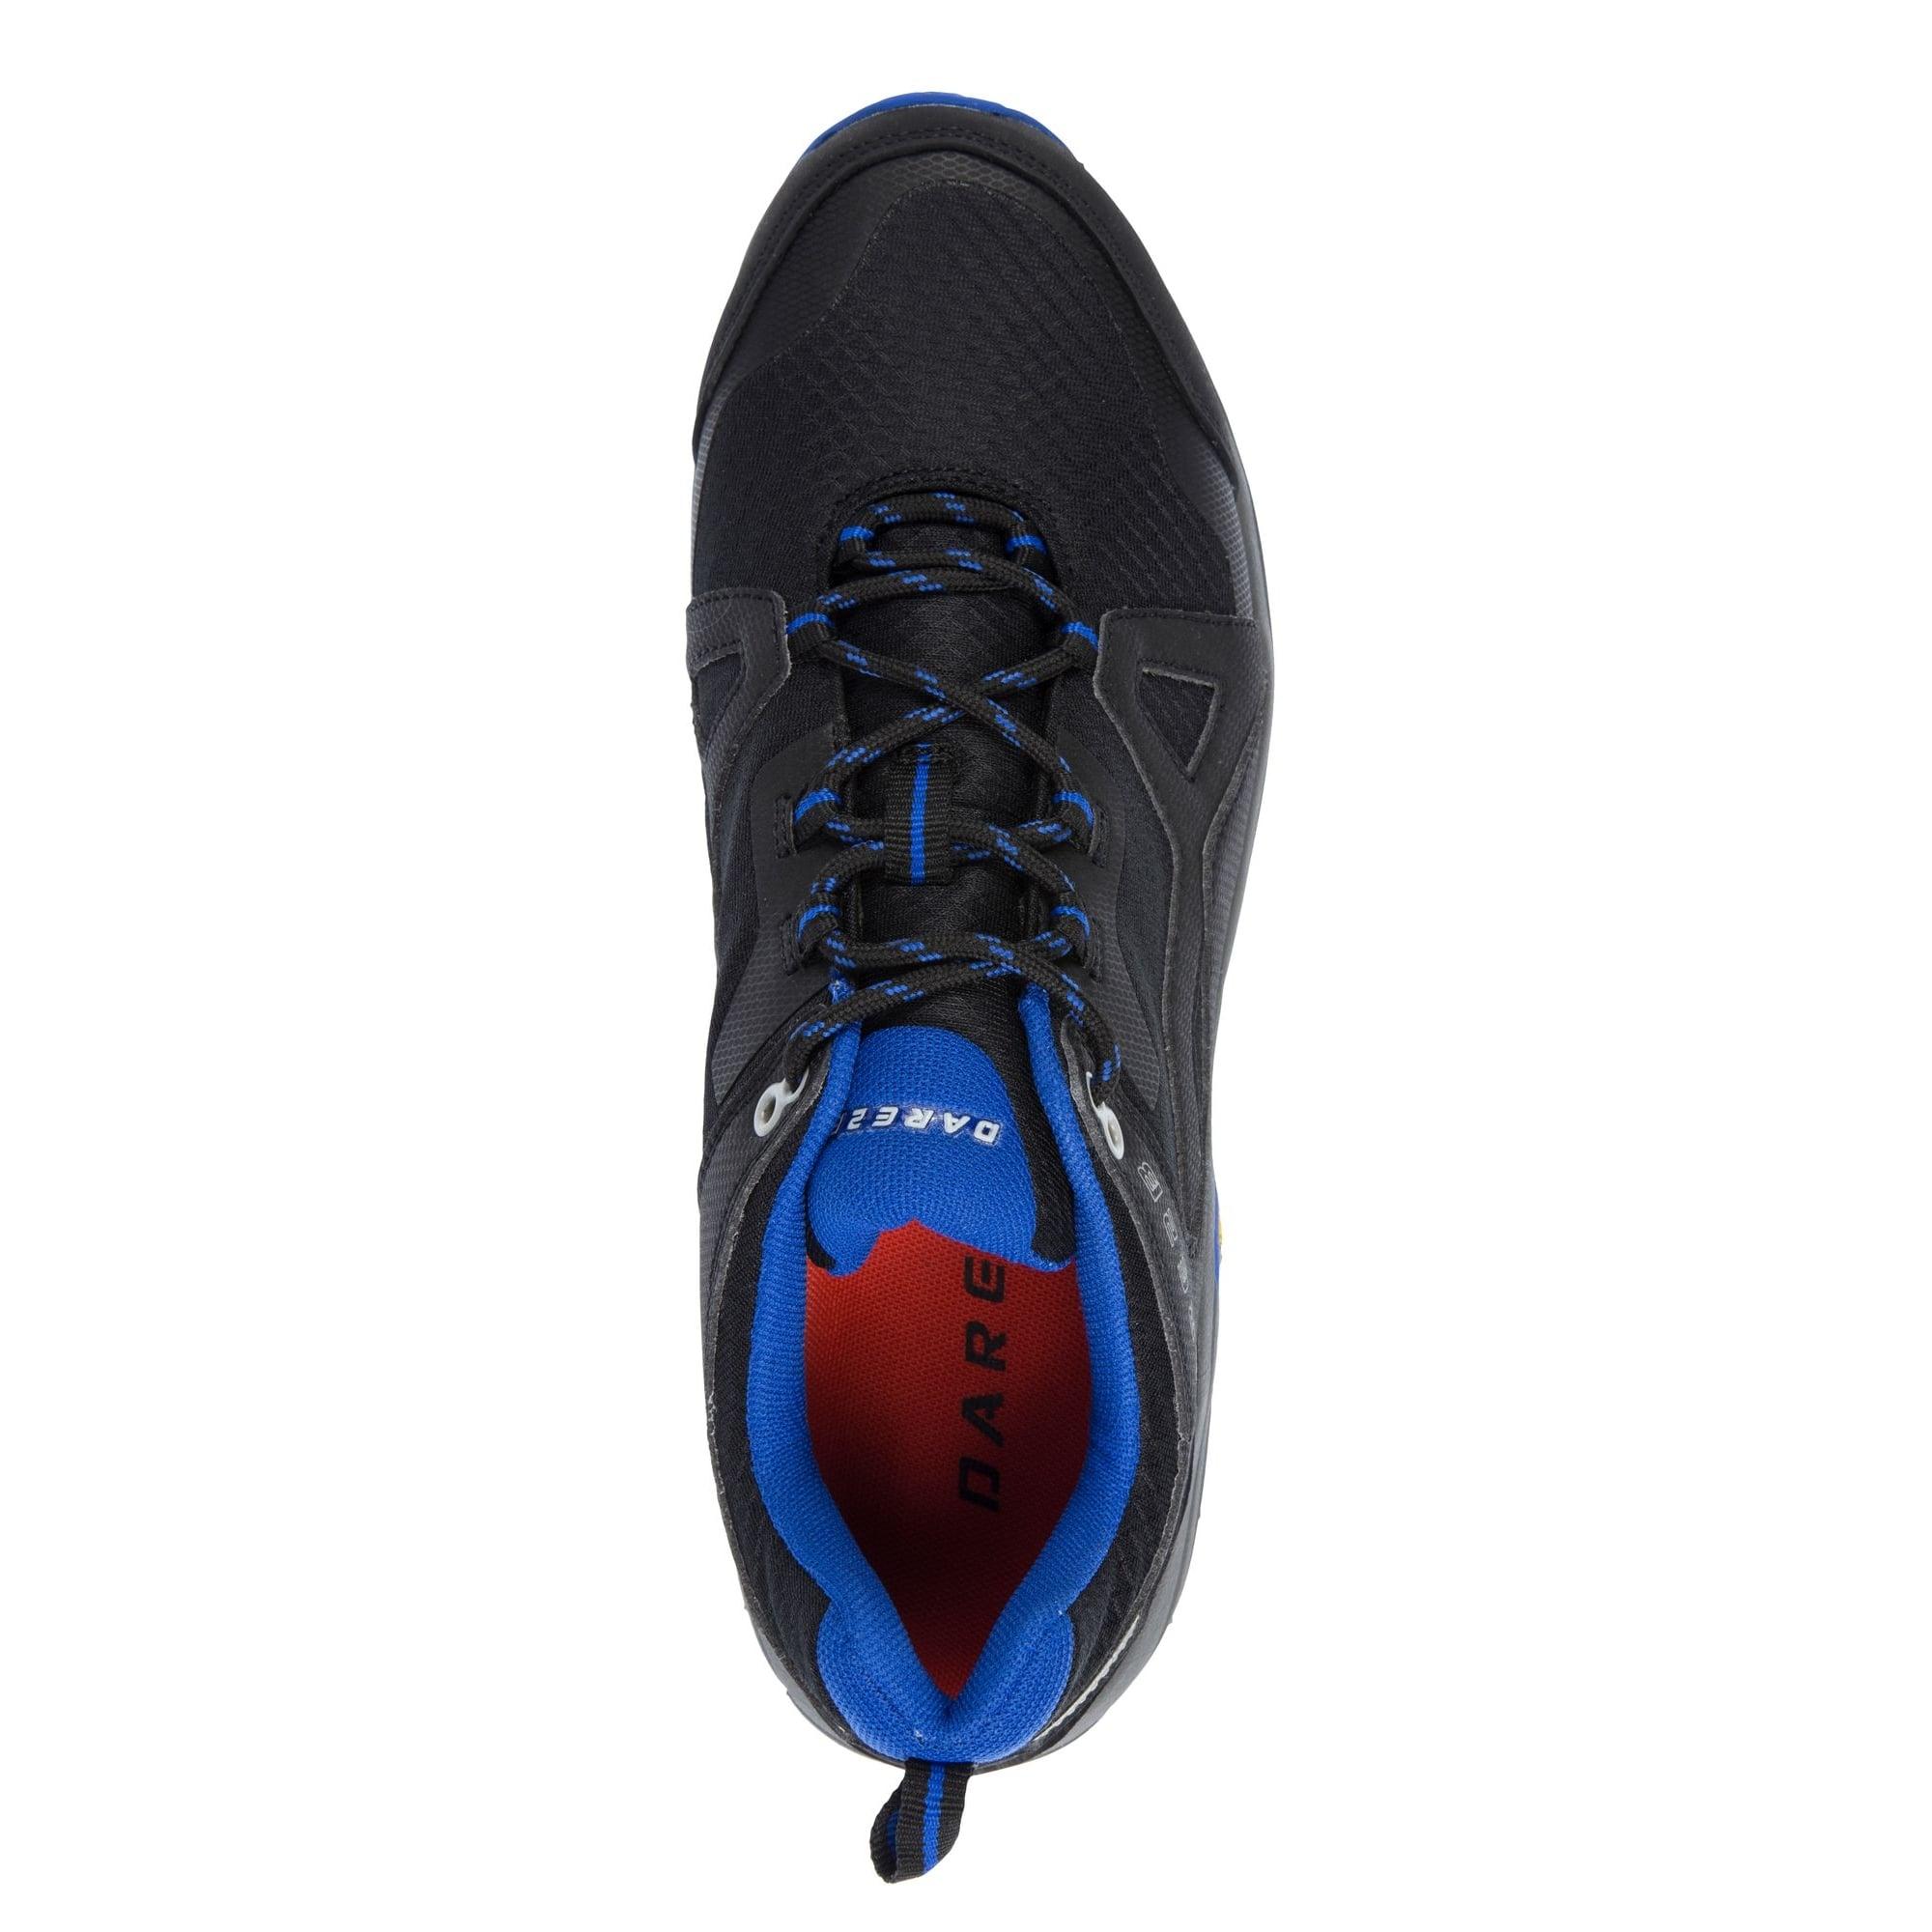 Dare2B-Cohesion-Mens-Waterproof-Lightweight-Low-Hiking-Walking-Shoes thumbnail 5